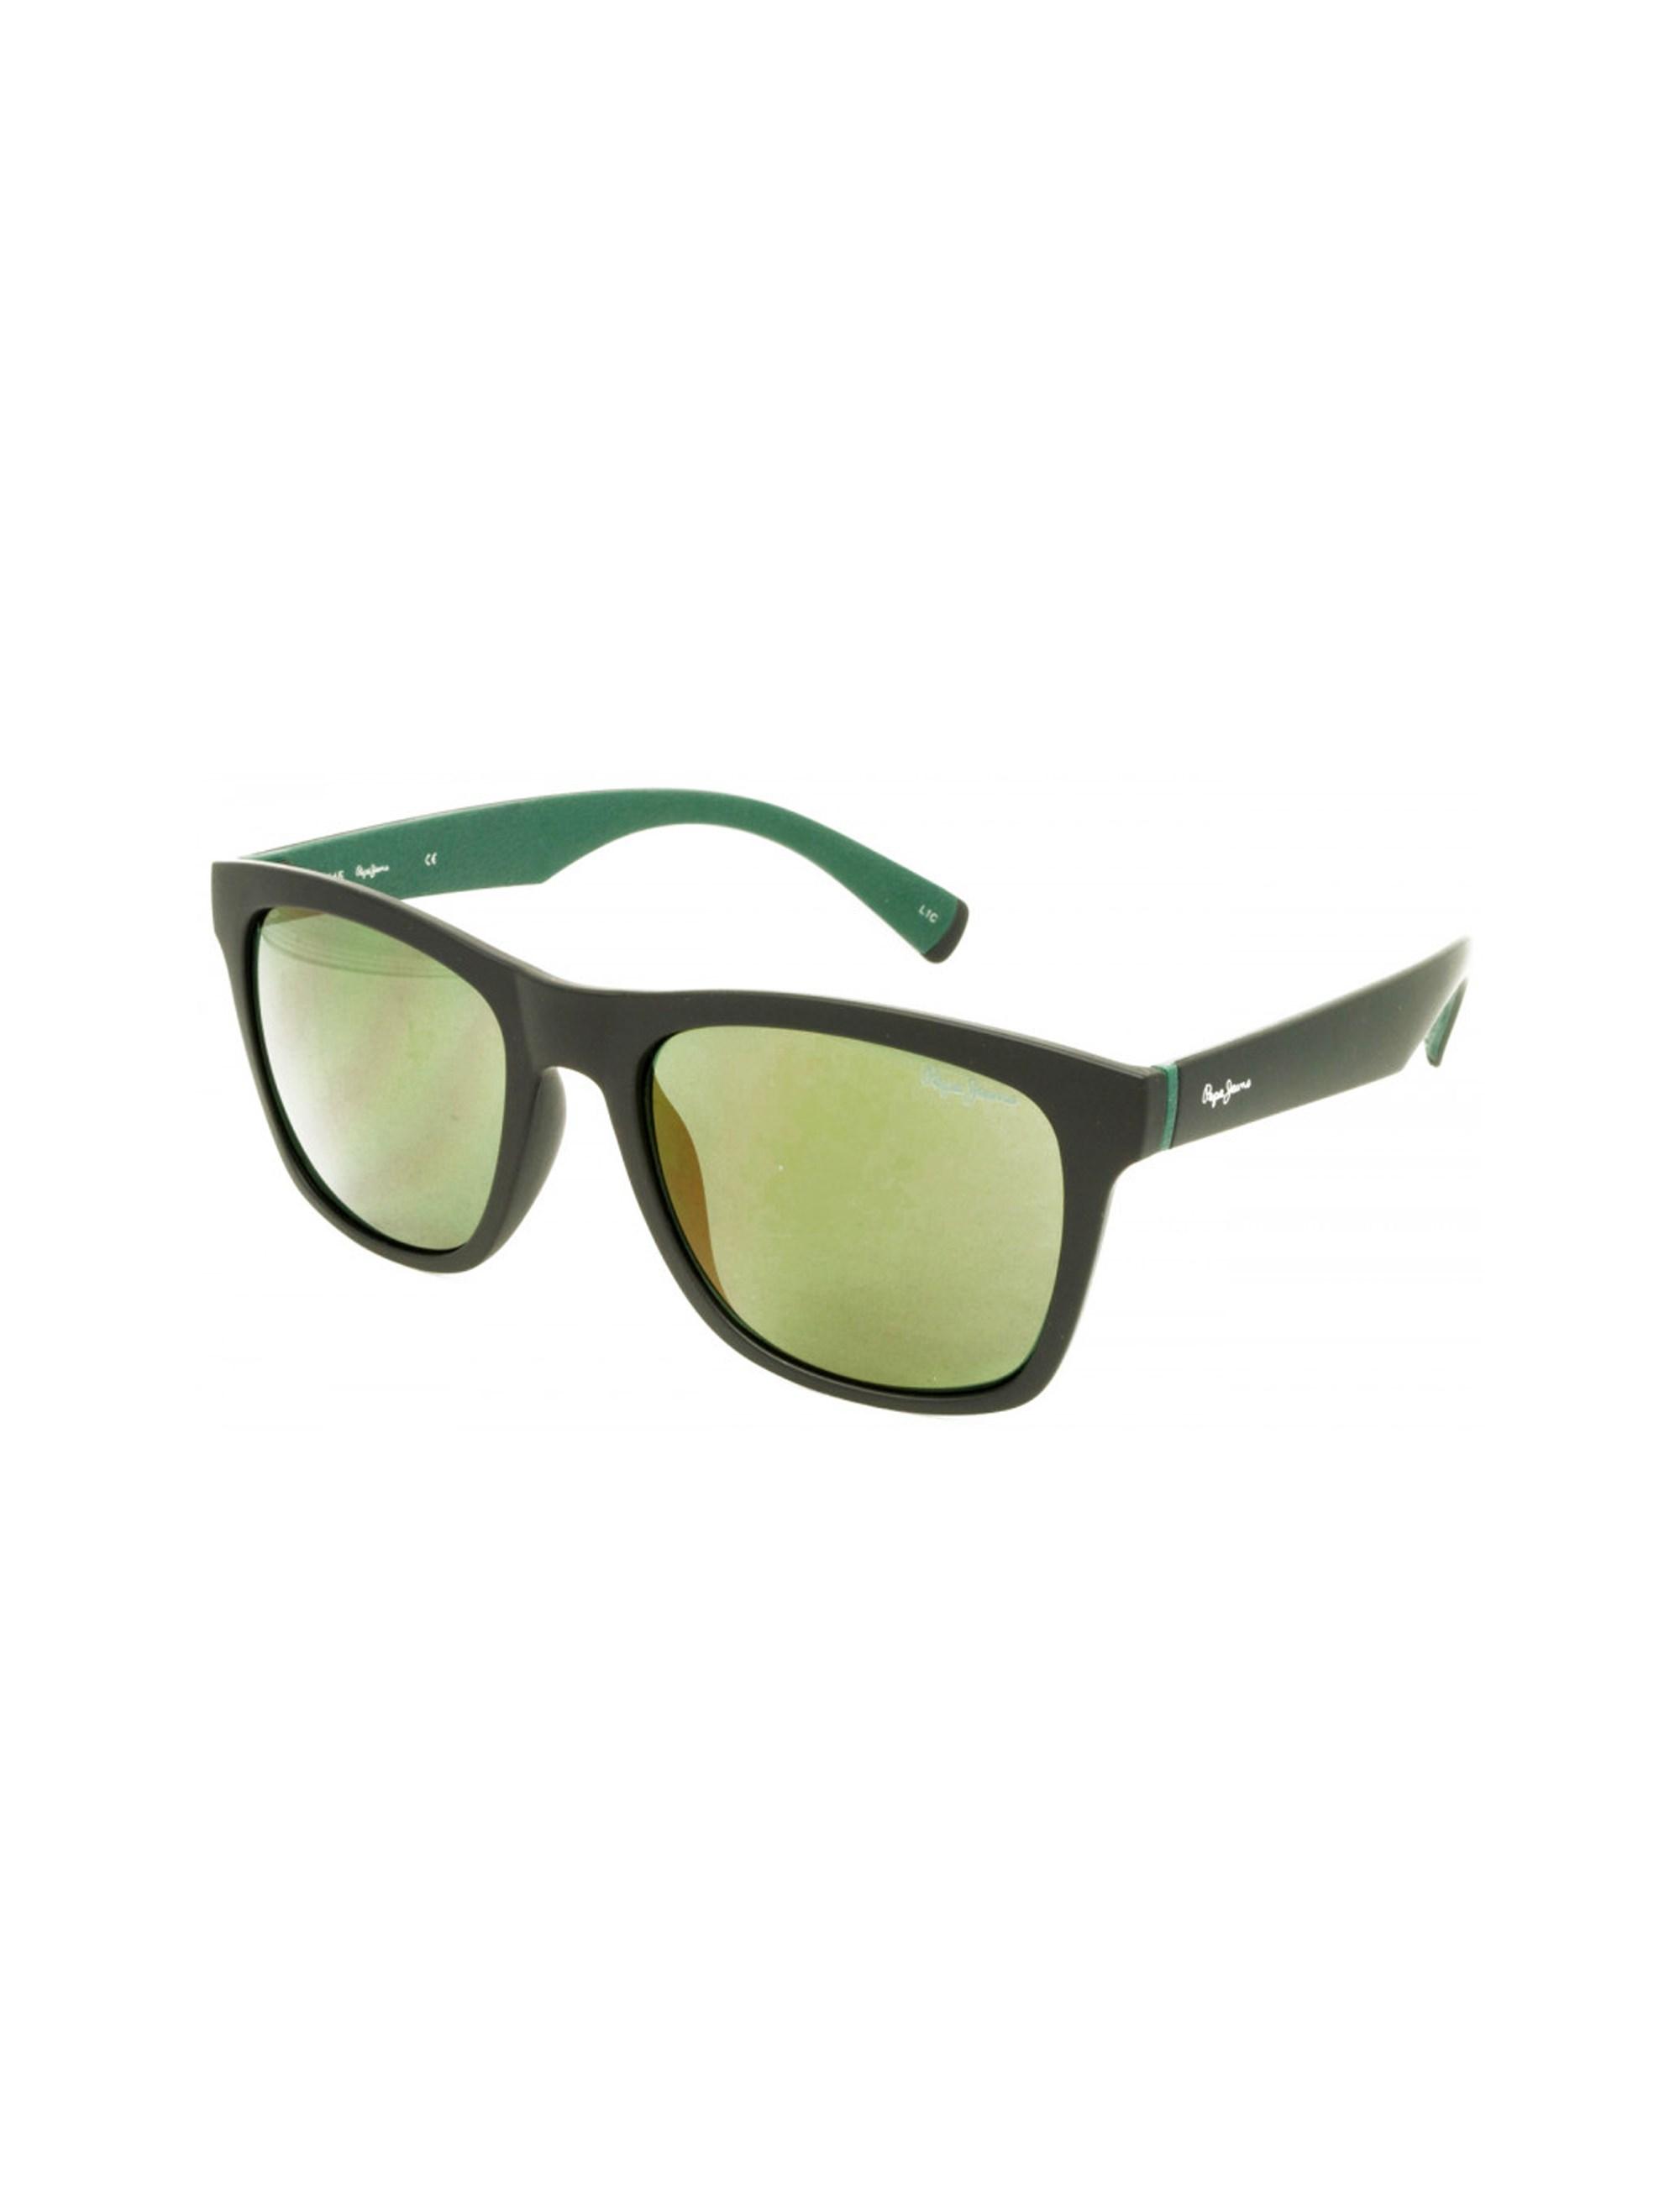 عینک آفتابی ویفرر مردانه - پپه جینز - مشکي - 3